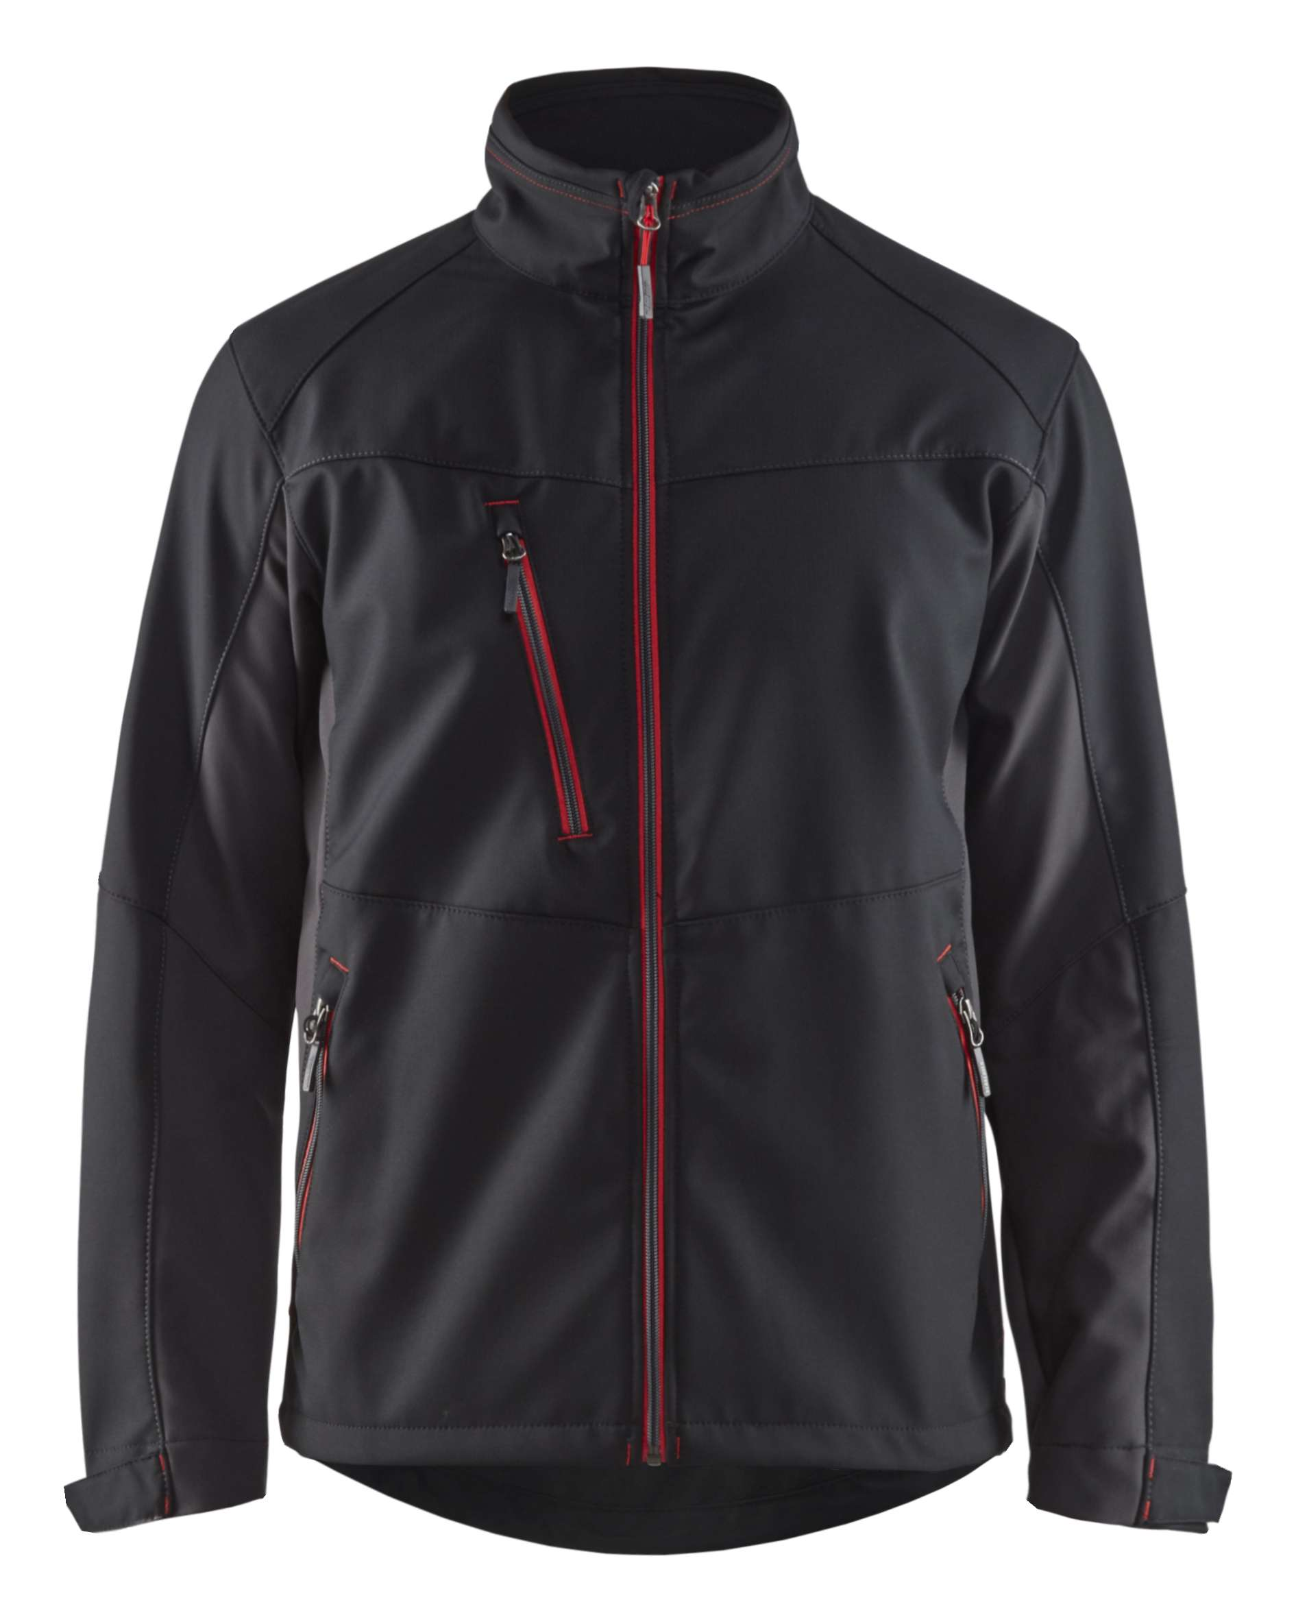 Blaklader Softshell jacks 49502516 zwart-rood(9956)